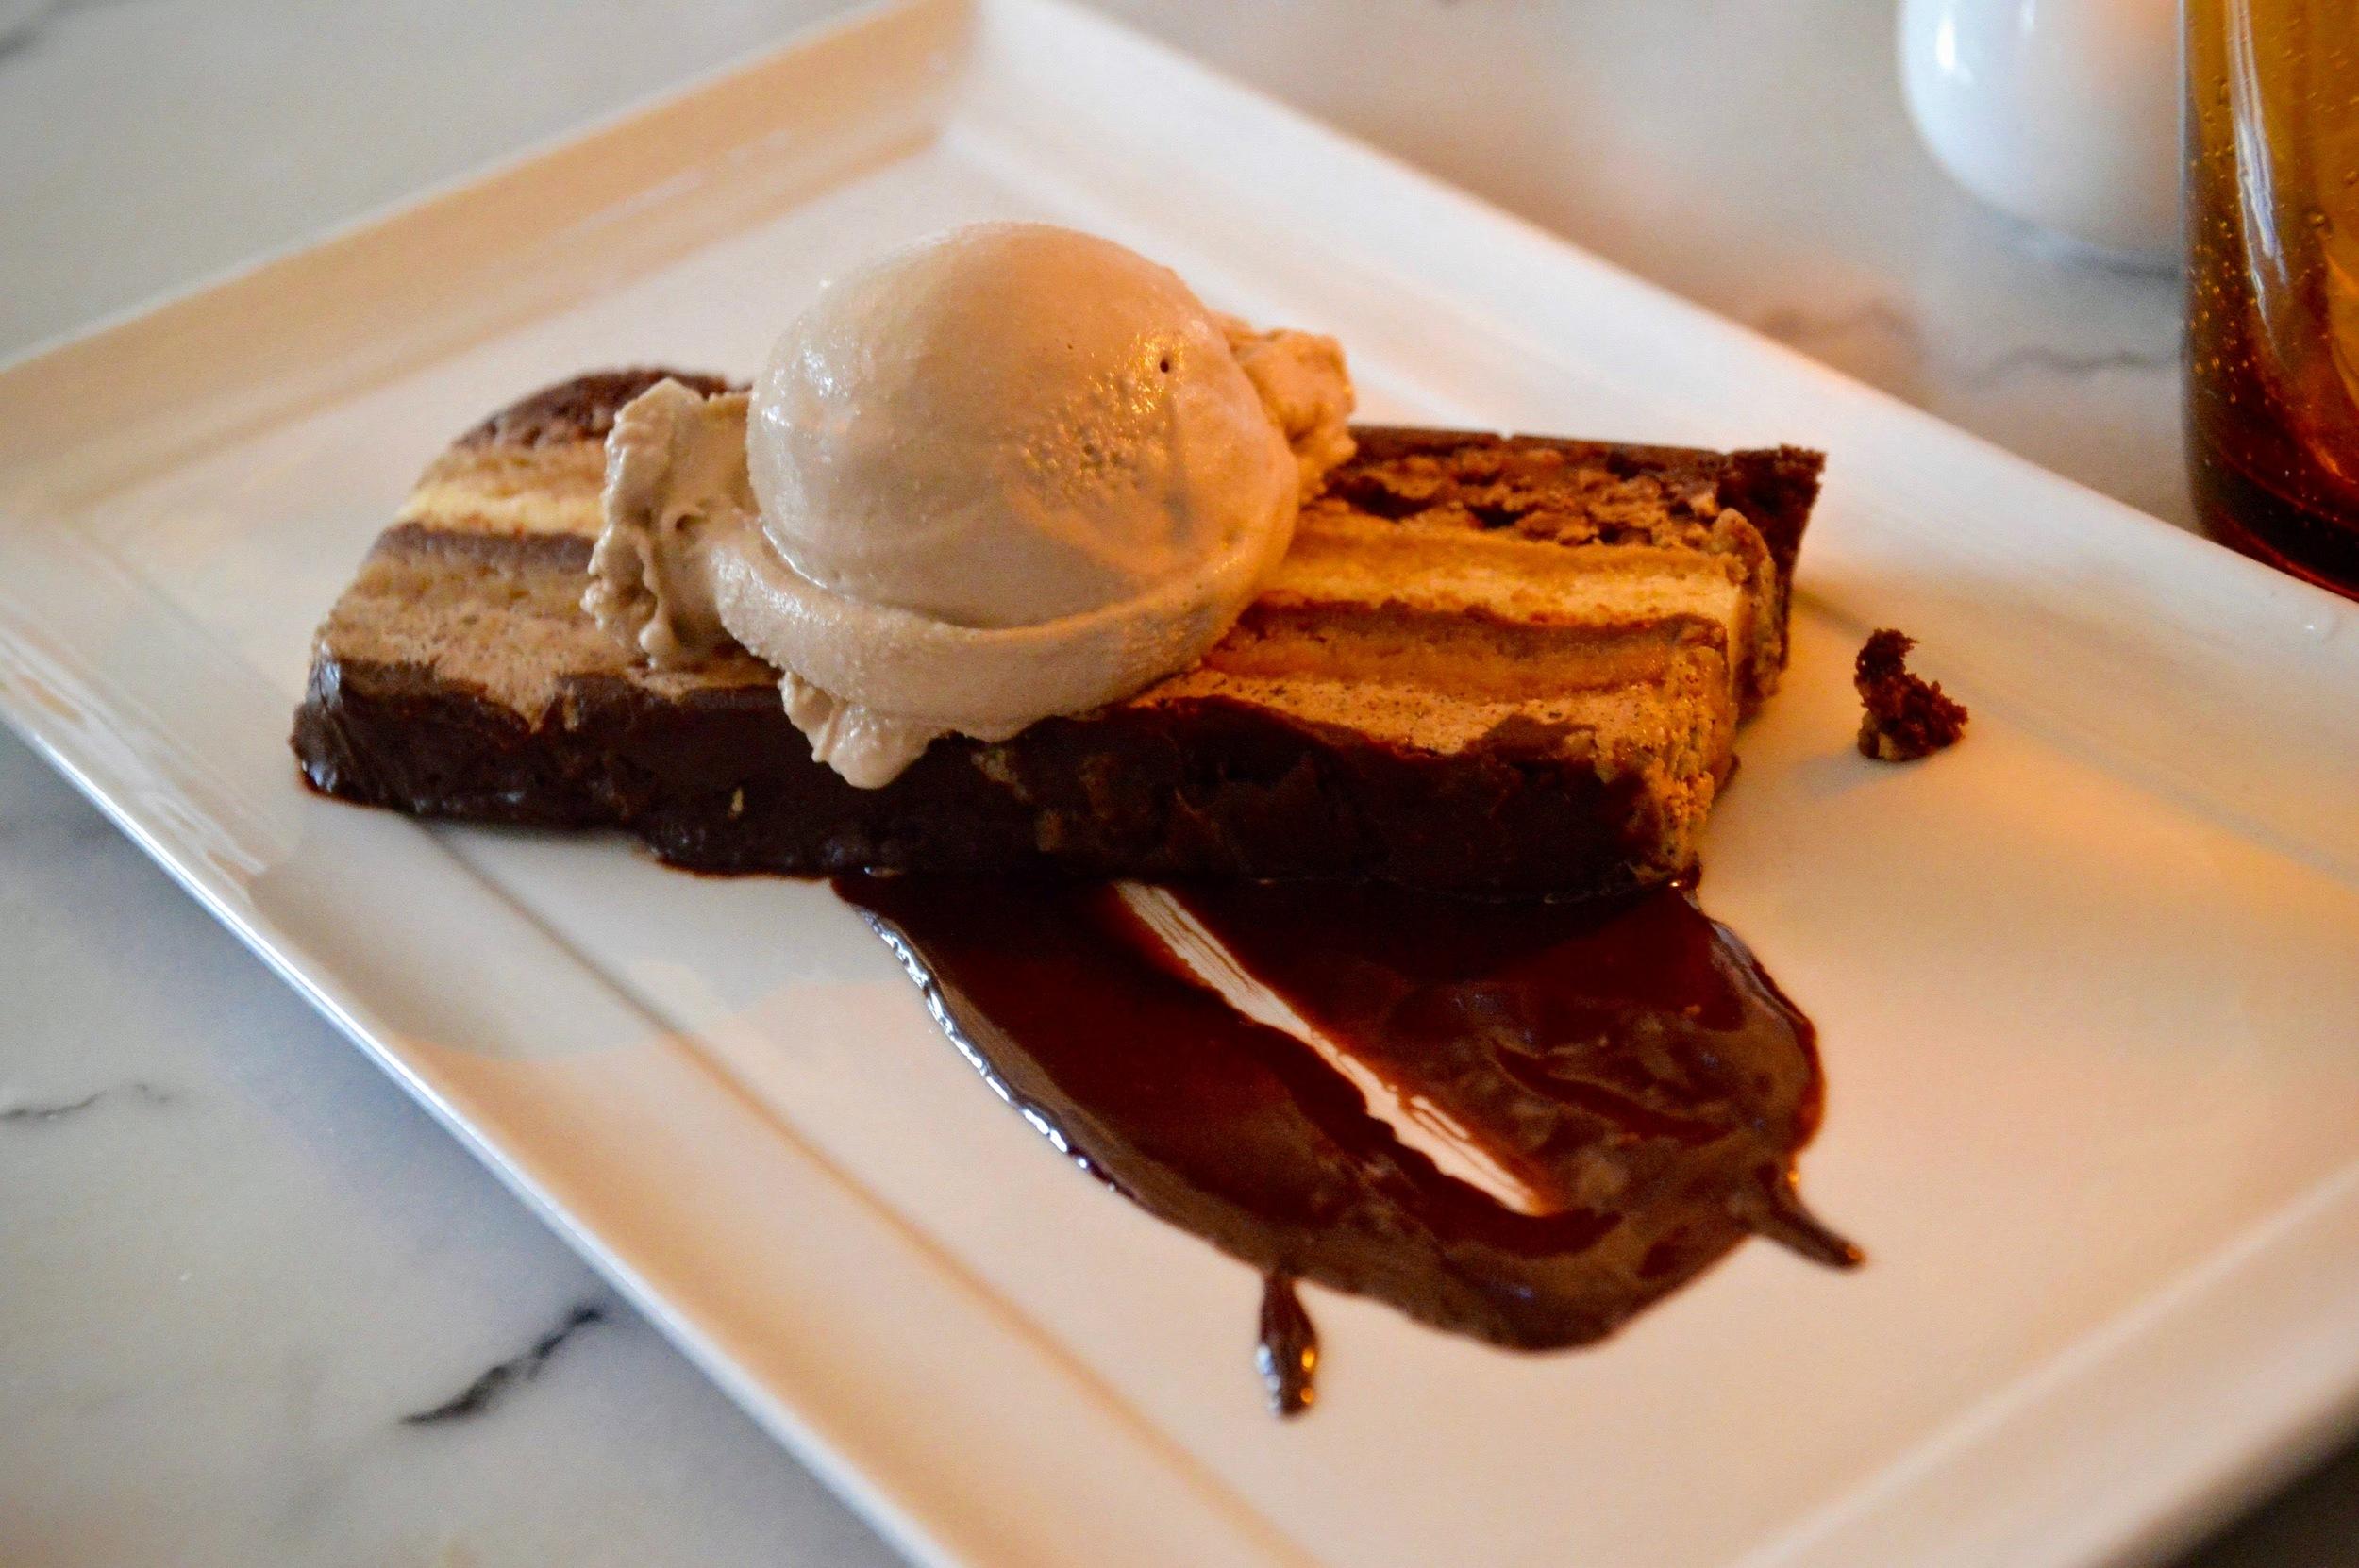 Dark Chocolate Opera  - Layered sponge cake soaked in coffee syrup, bittersweet chocolate sauce, hazelnut crunch, bourbon gelato